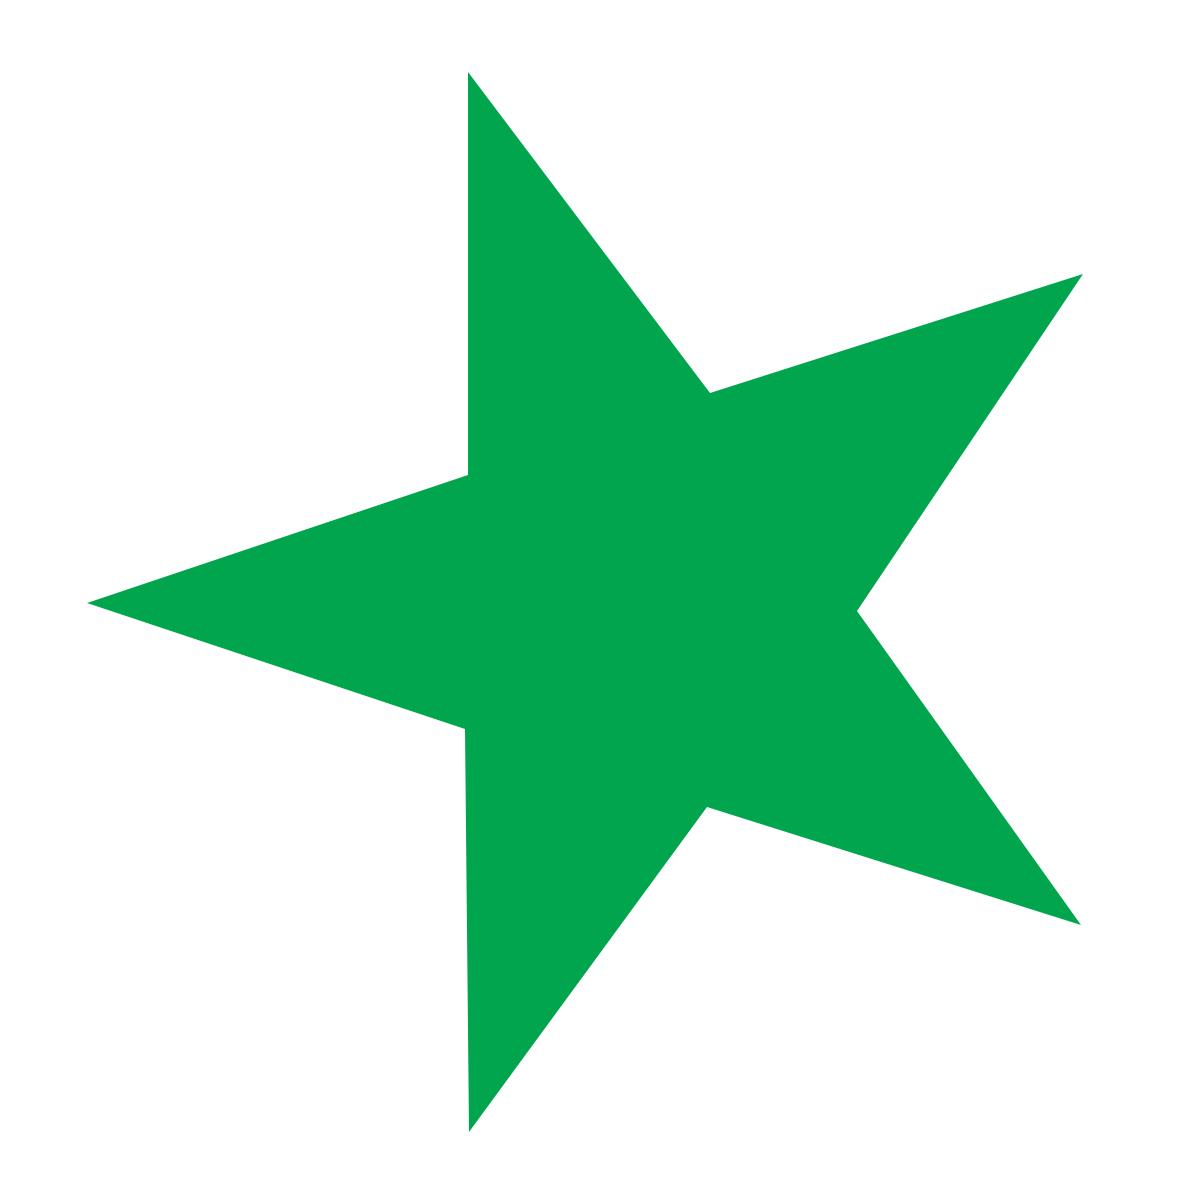 Westcott westcott green stars colour stars